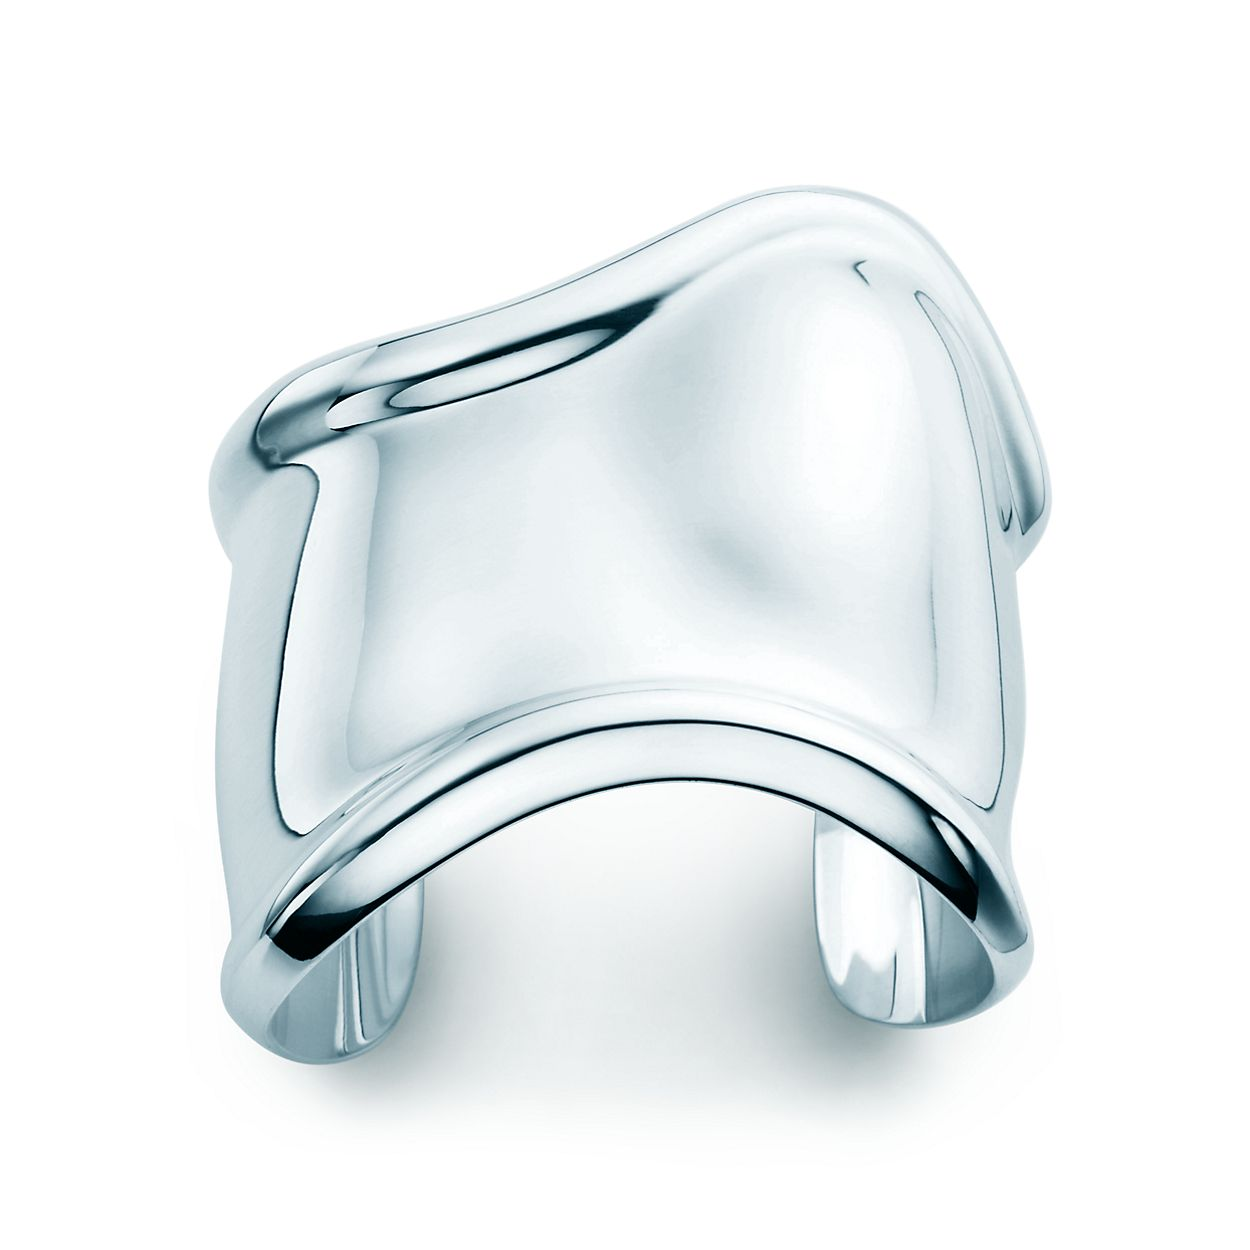 Elsa Peretti Bone cuff in sterling silver, medium, left wrist - Size Medium Tiffany & Co.